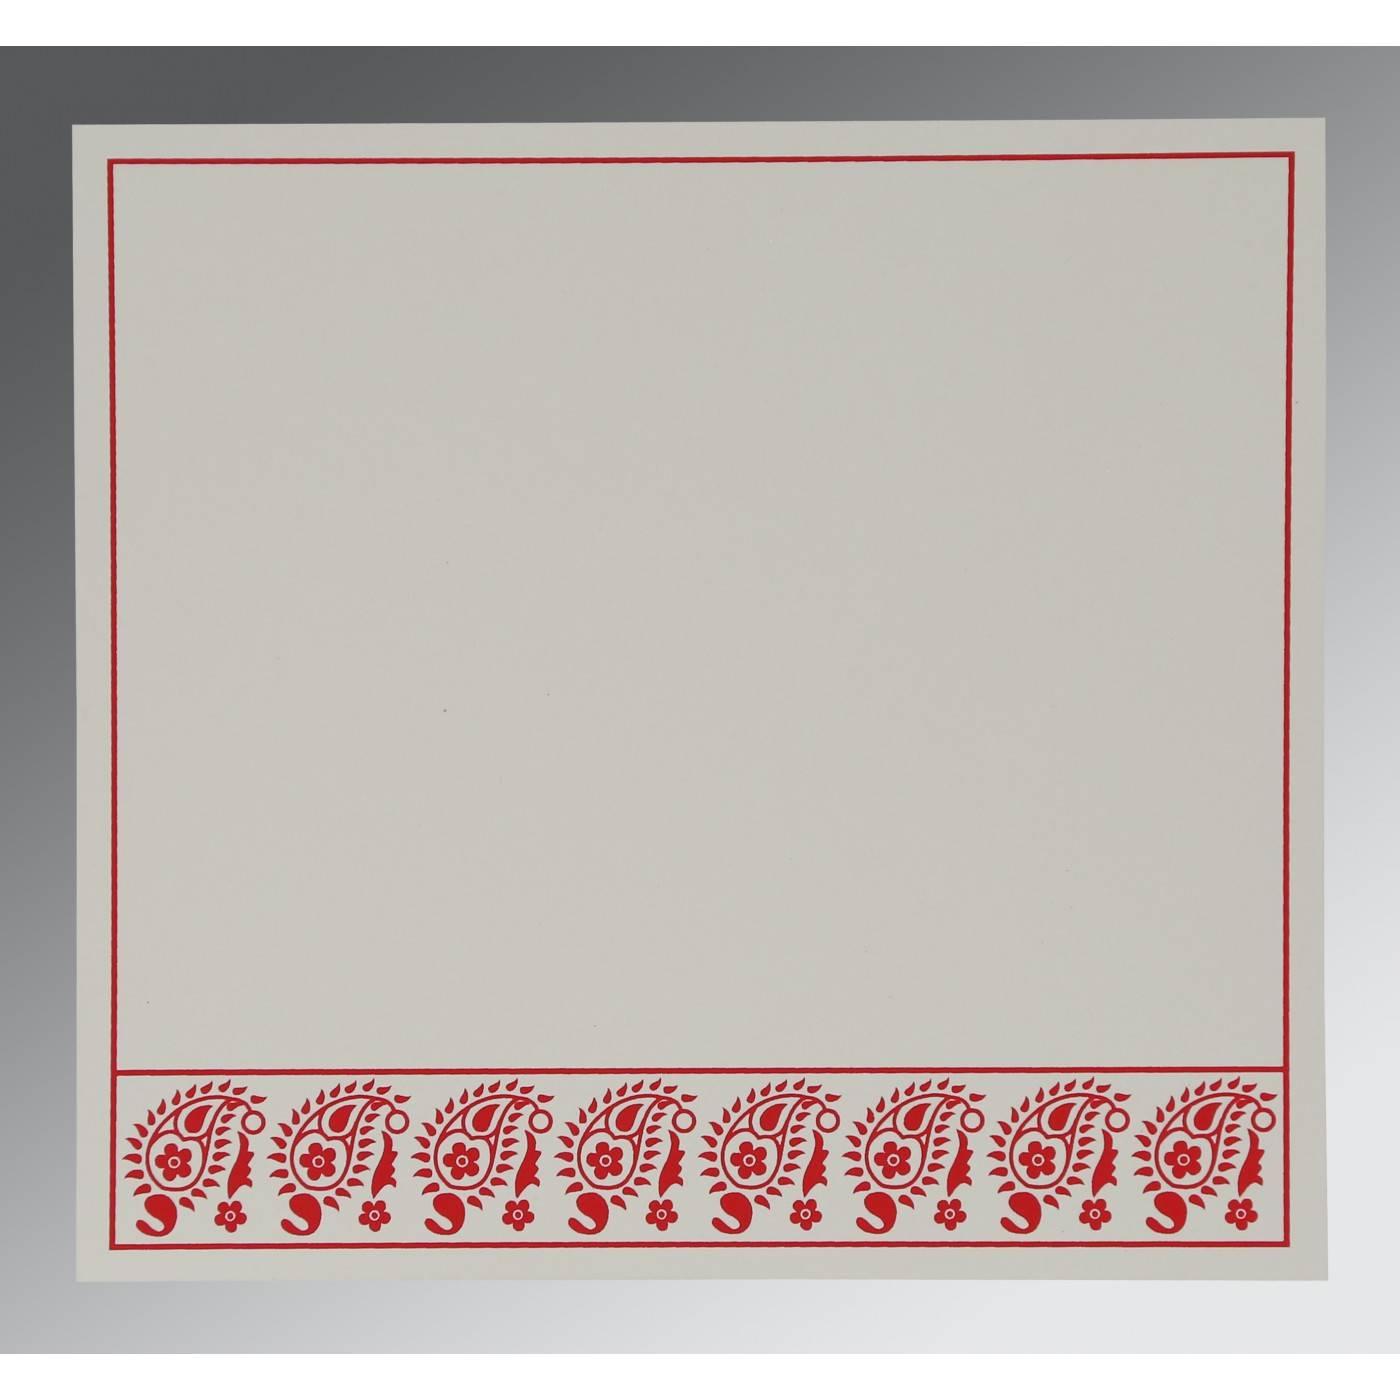 SCARLET WOOLY FLORAL THEMED - SCREEN PRINTED WEDDING CARD : CG-8218M - IndianWeddingCards